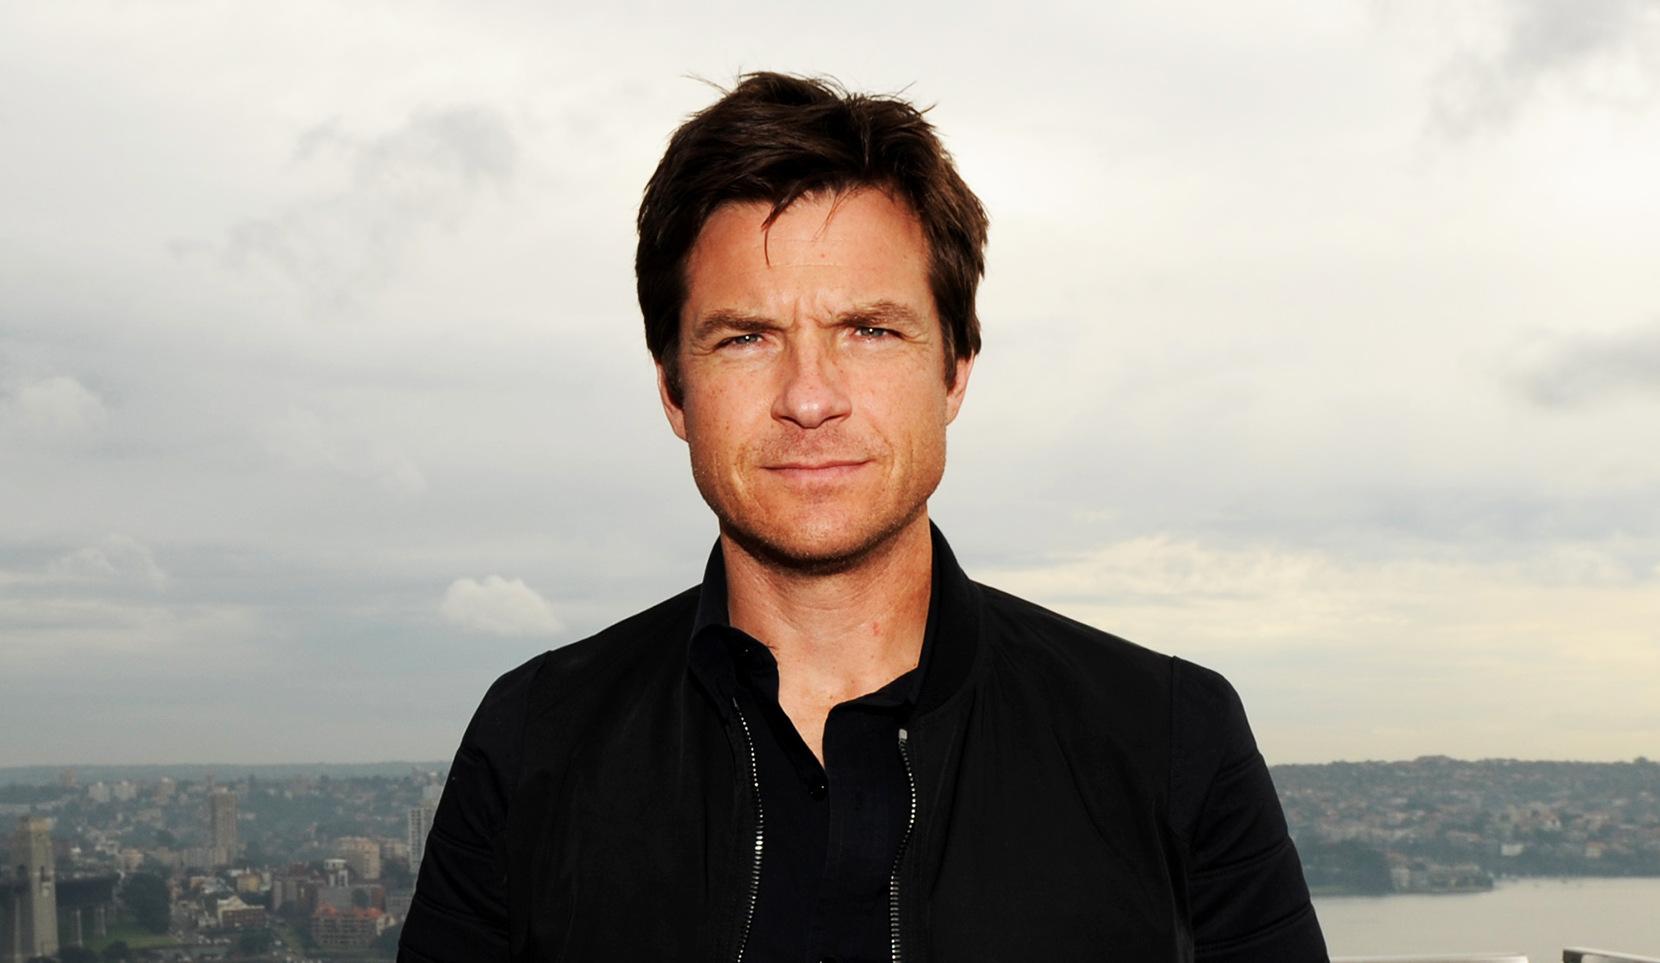 Jason Bateman dirigirá el thriller Shut In de New Line